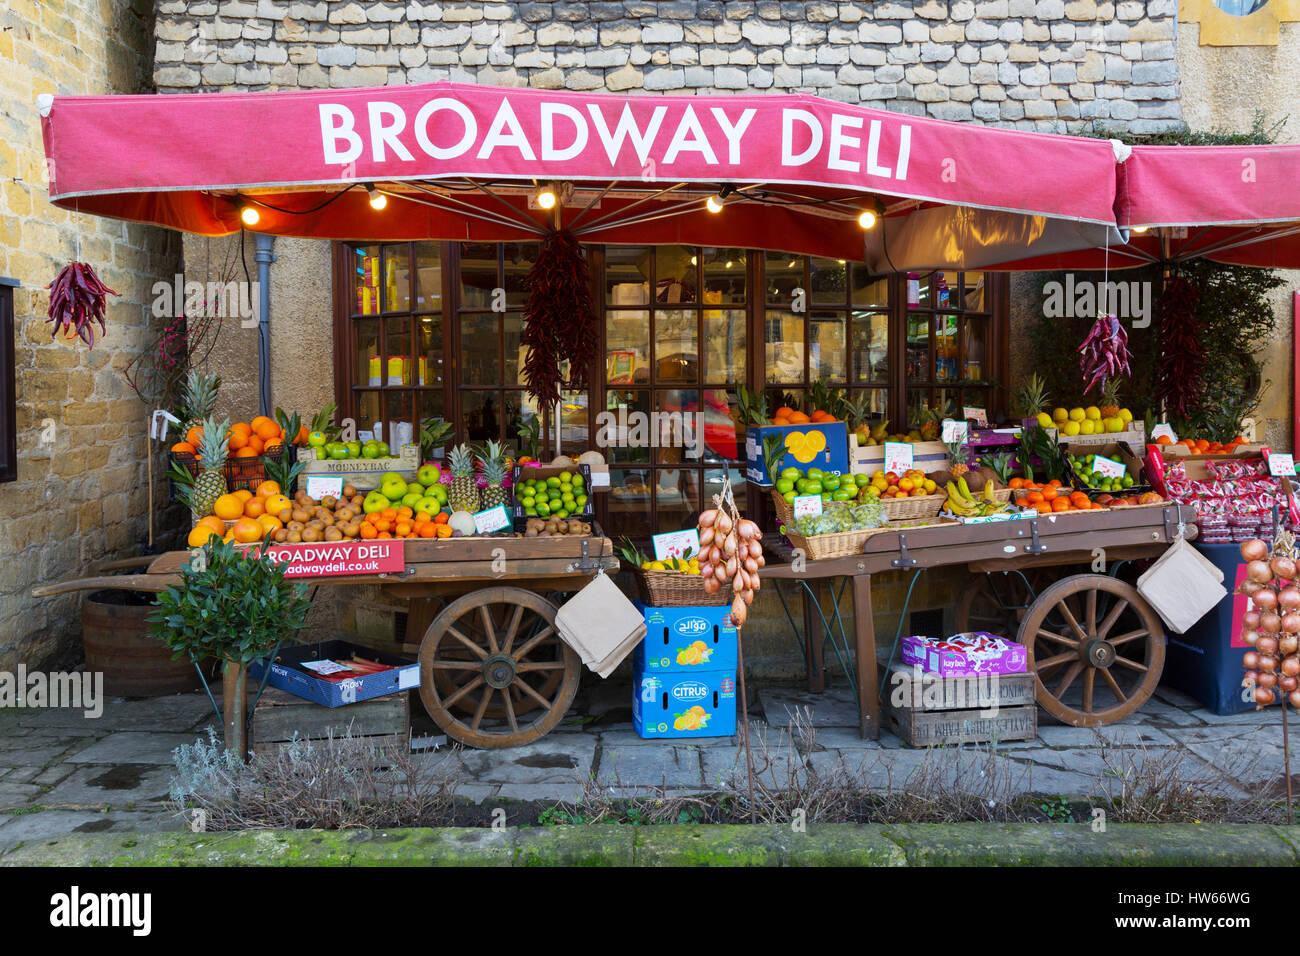 Broadway Deli shop, Broadway village, Cotswolds, Worsectershire, England UK - Stock Image